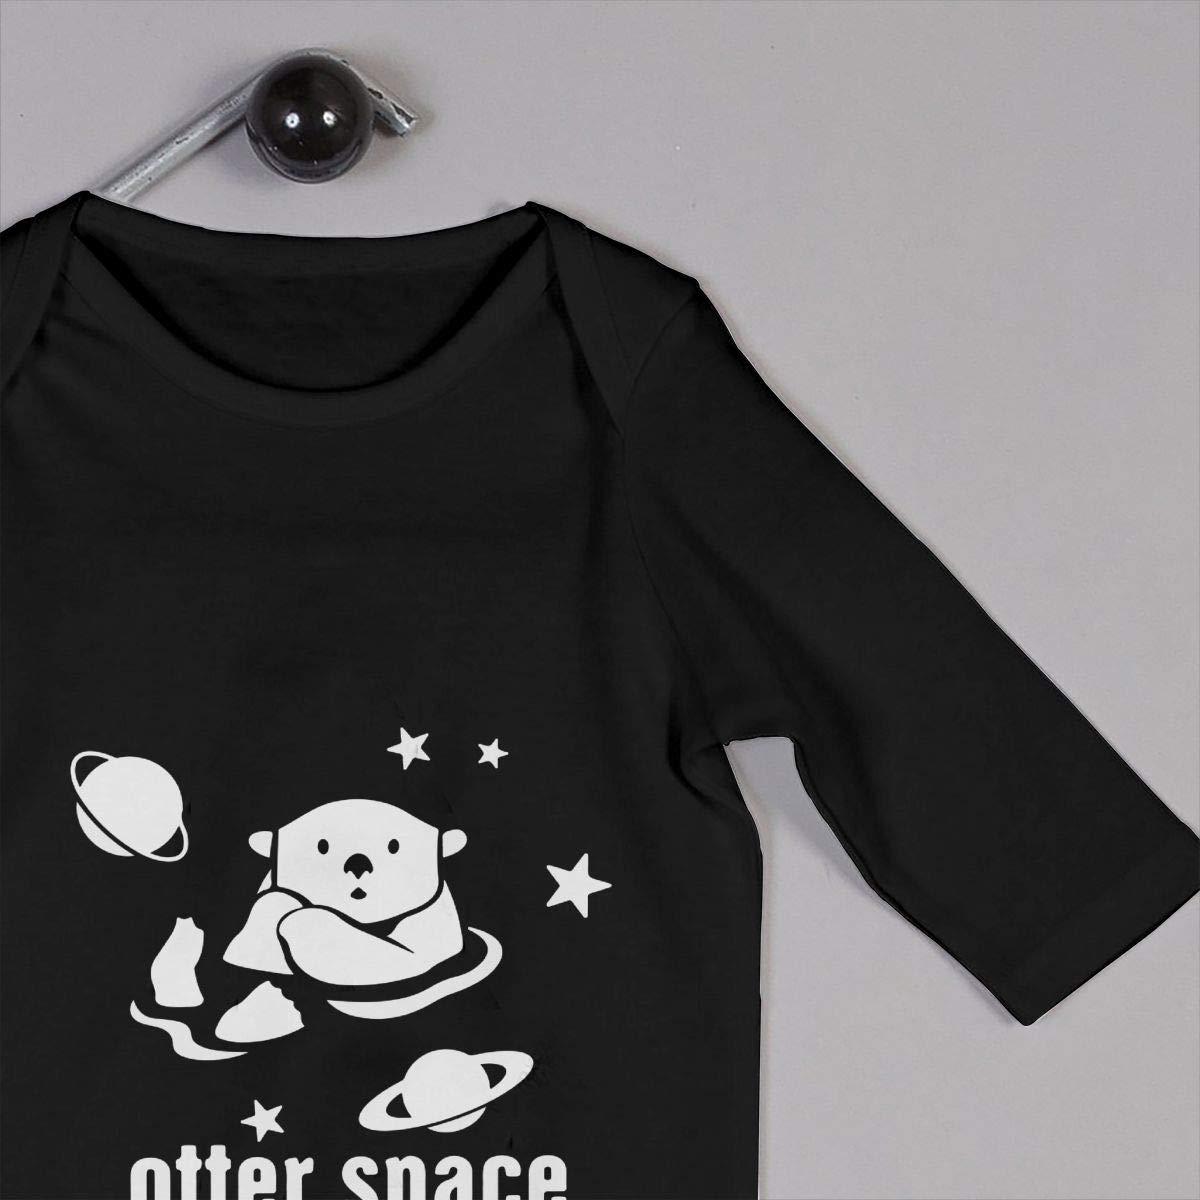 Comfortable Otter Space Cotton Sleepwear Db84UR@5p Newborn Baby Girls Boys Long Sleeve Bodysuit